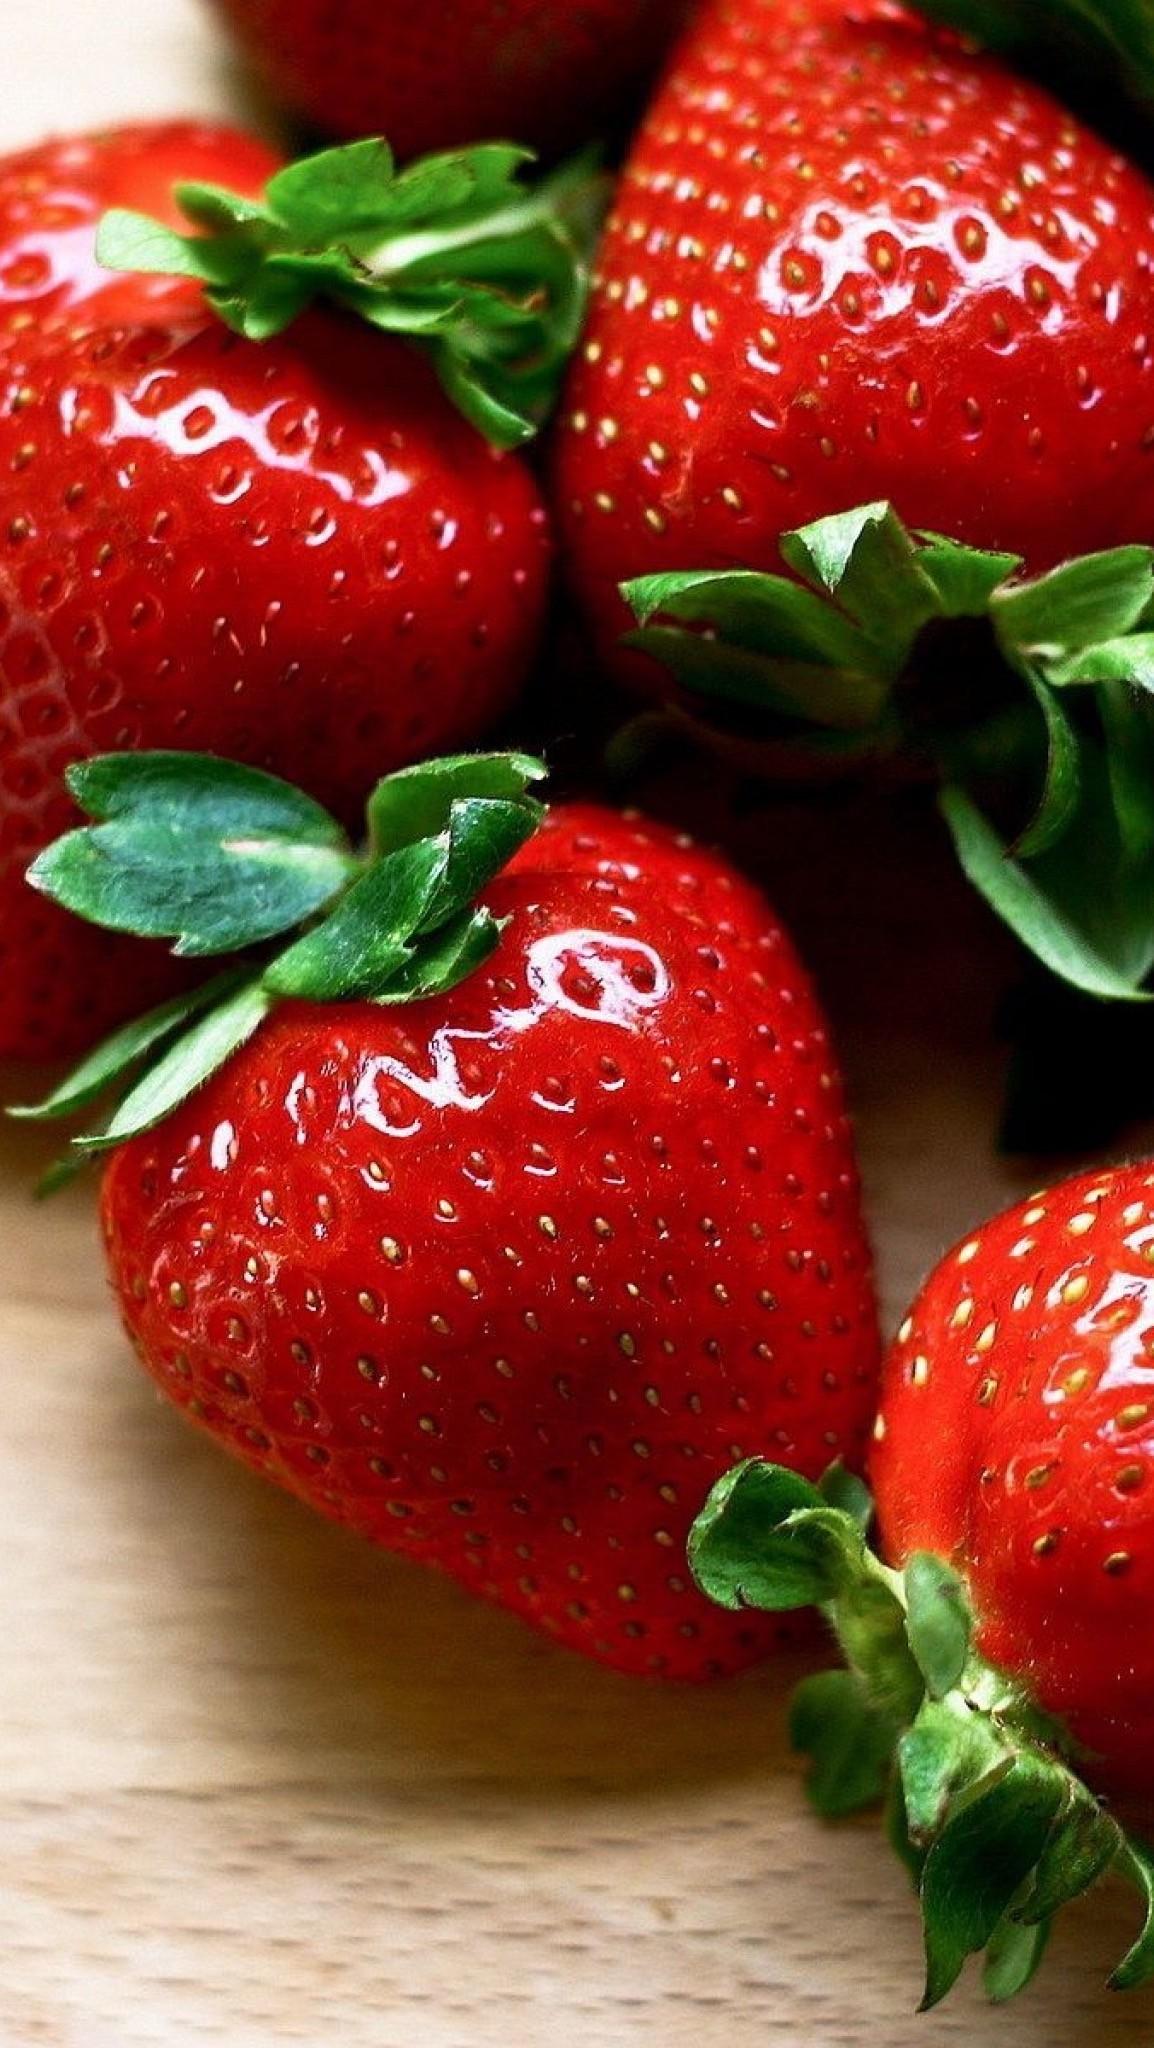 Обои wallpaper iPhone strawberry